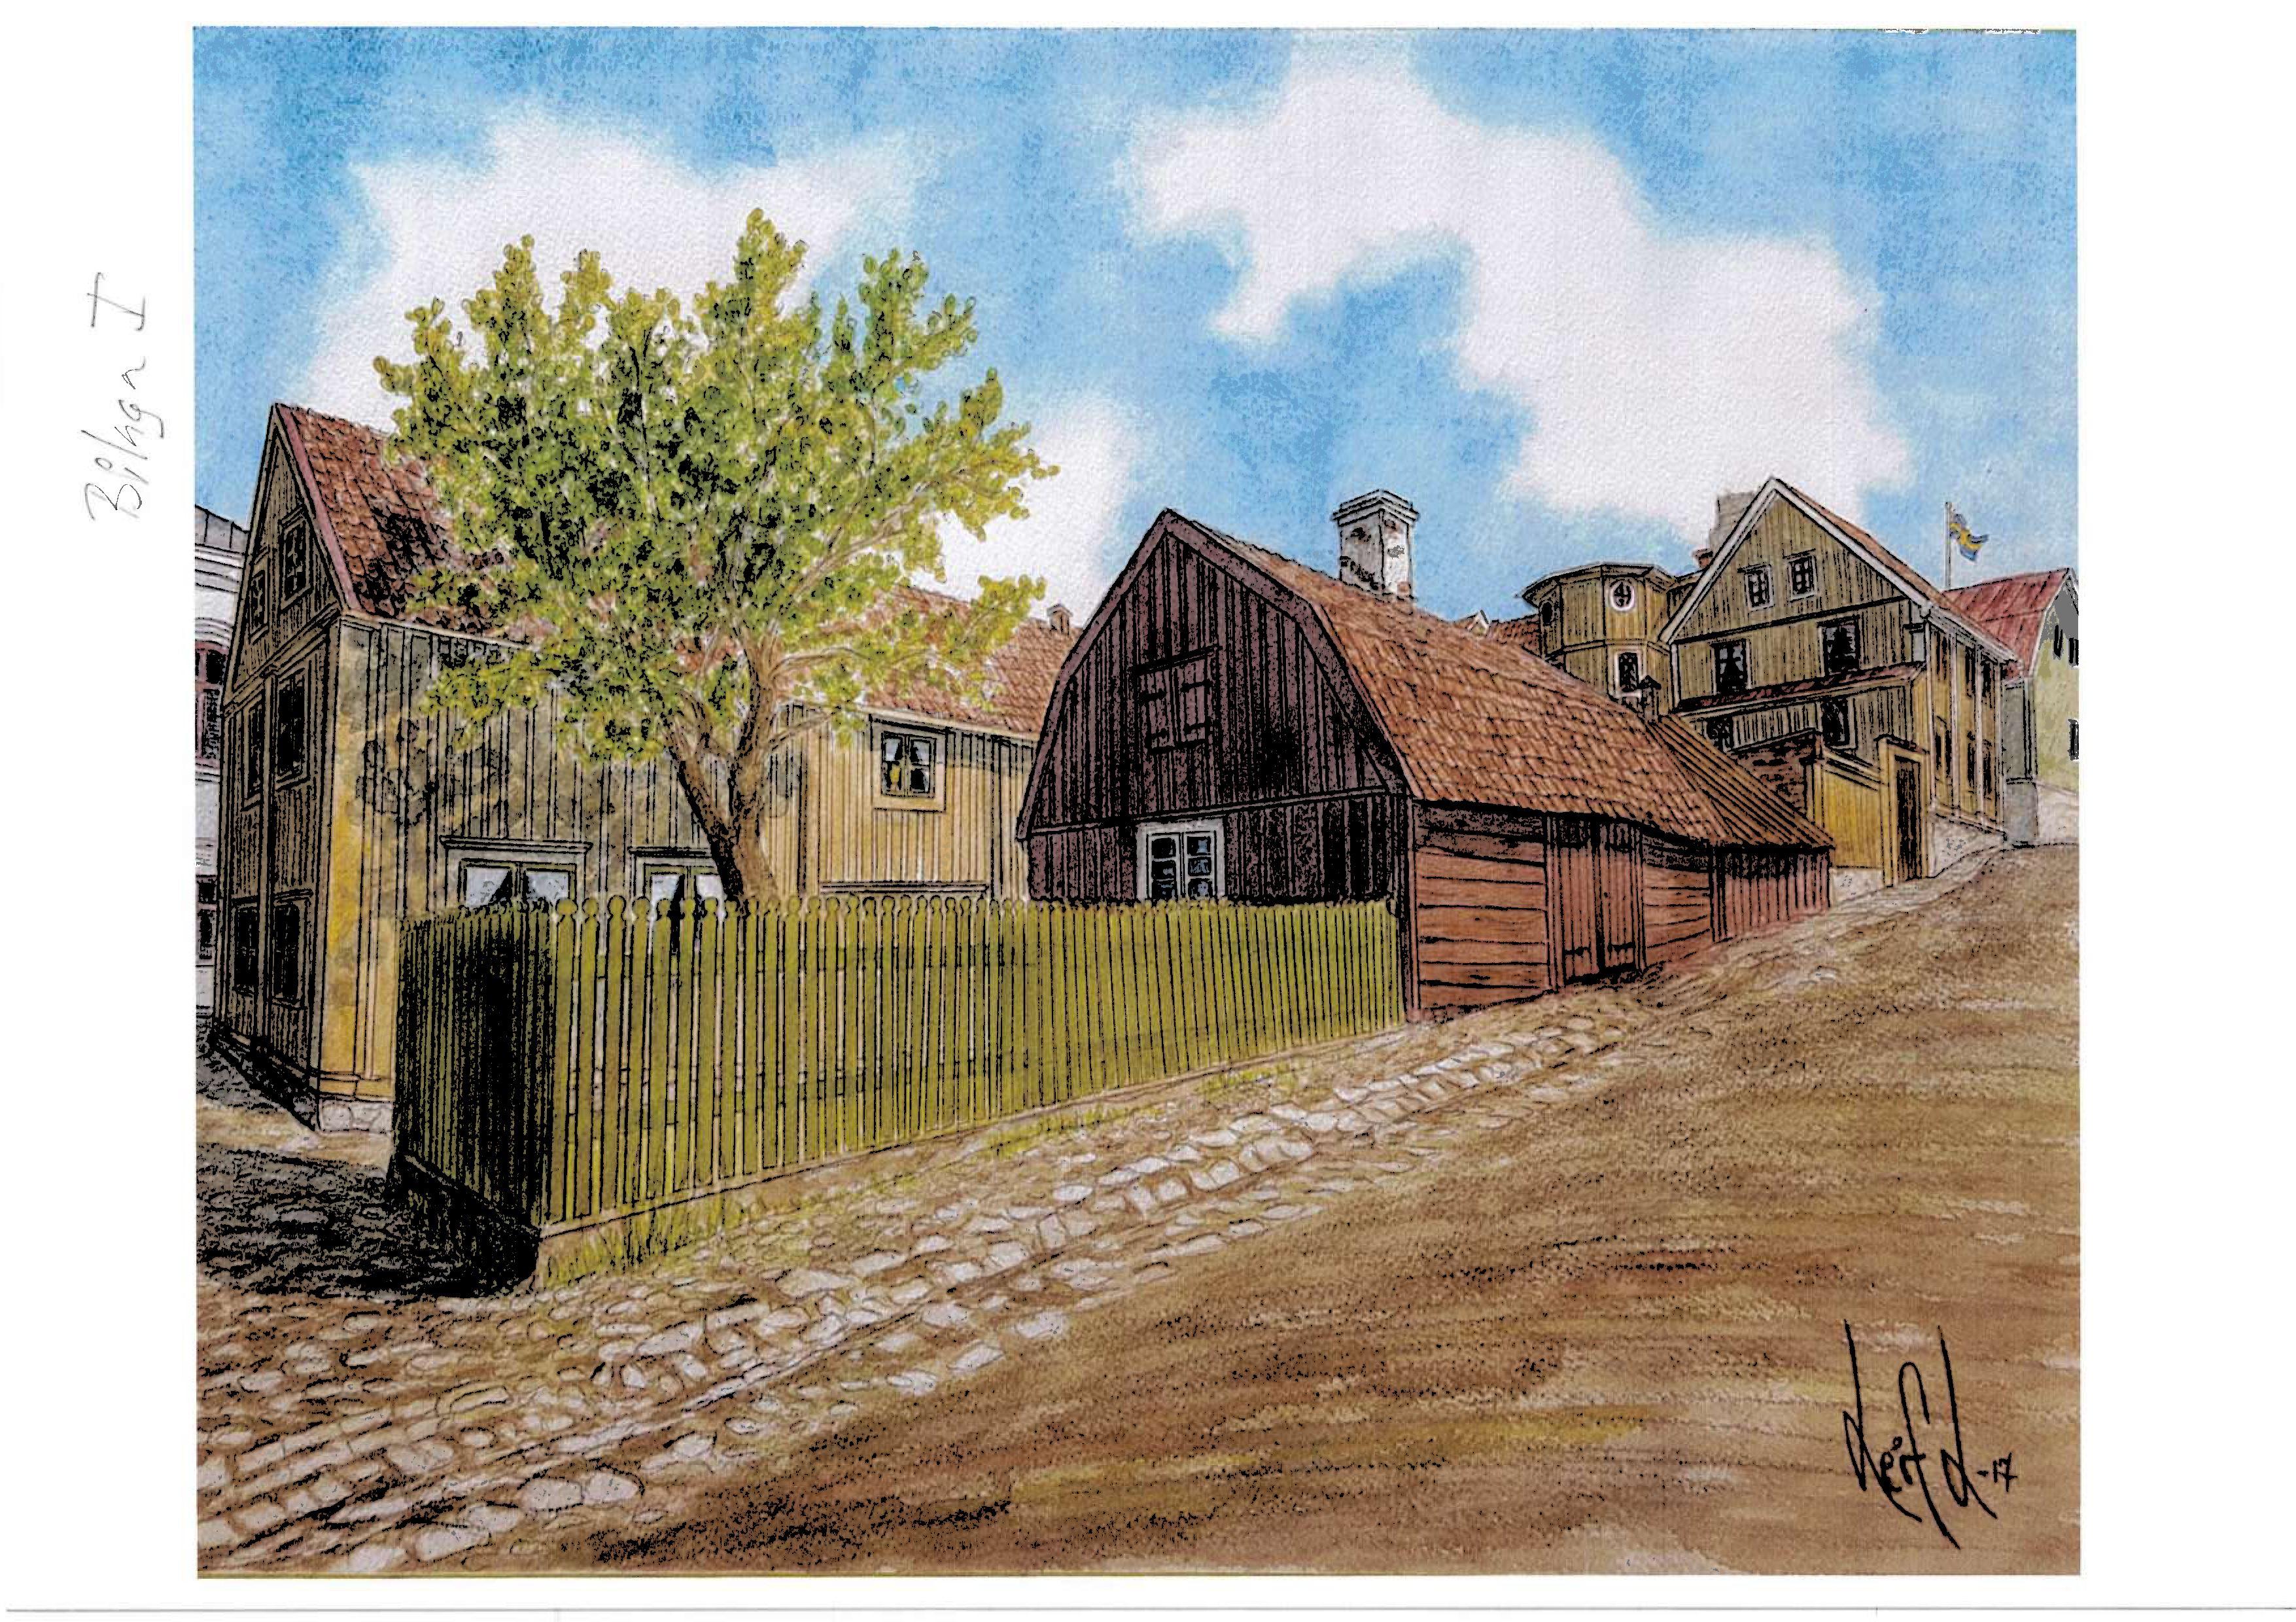 Carl XI och Carl XII:s visit in Karlshamn